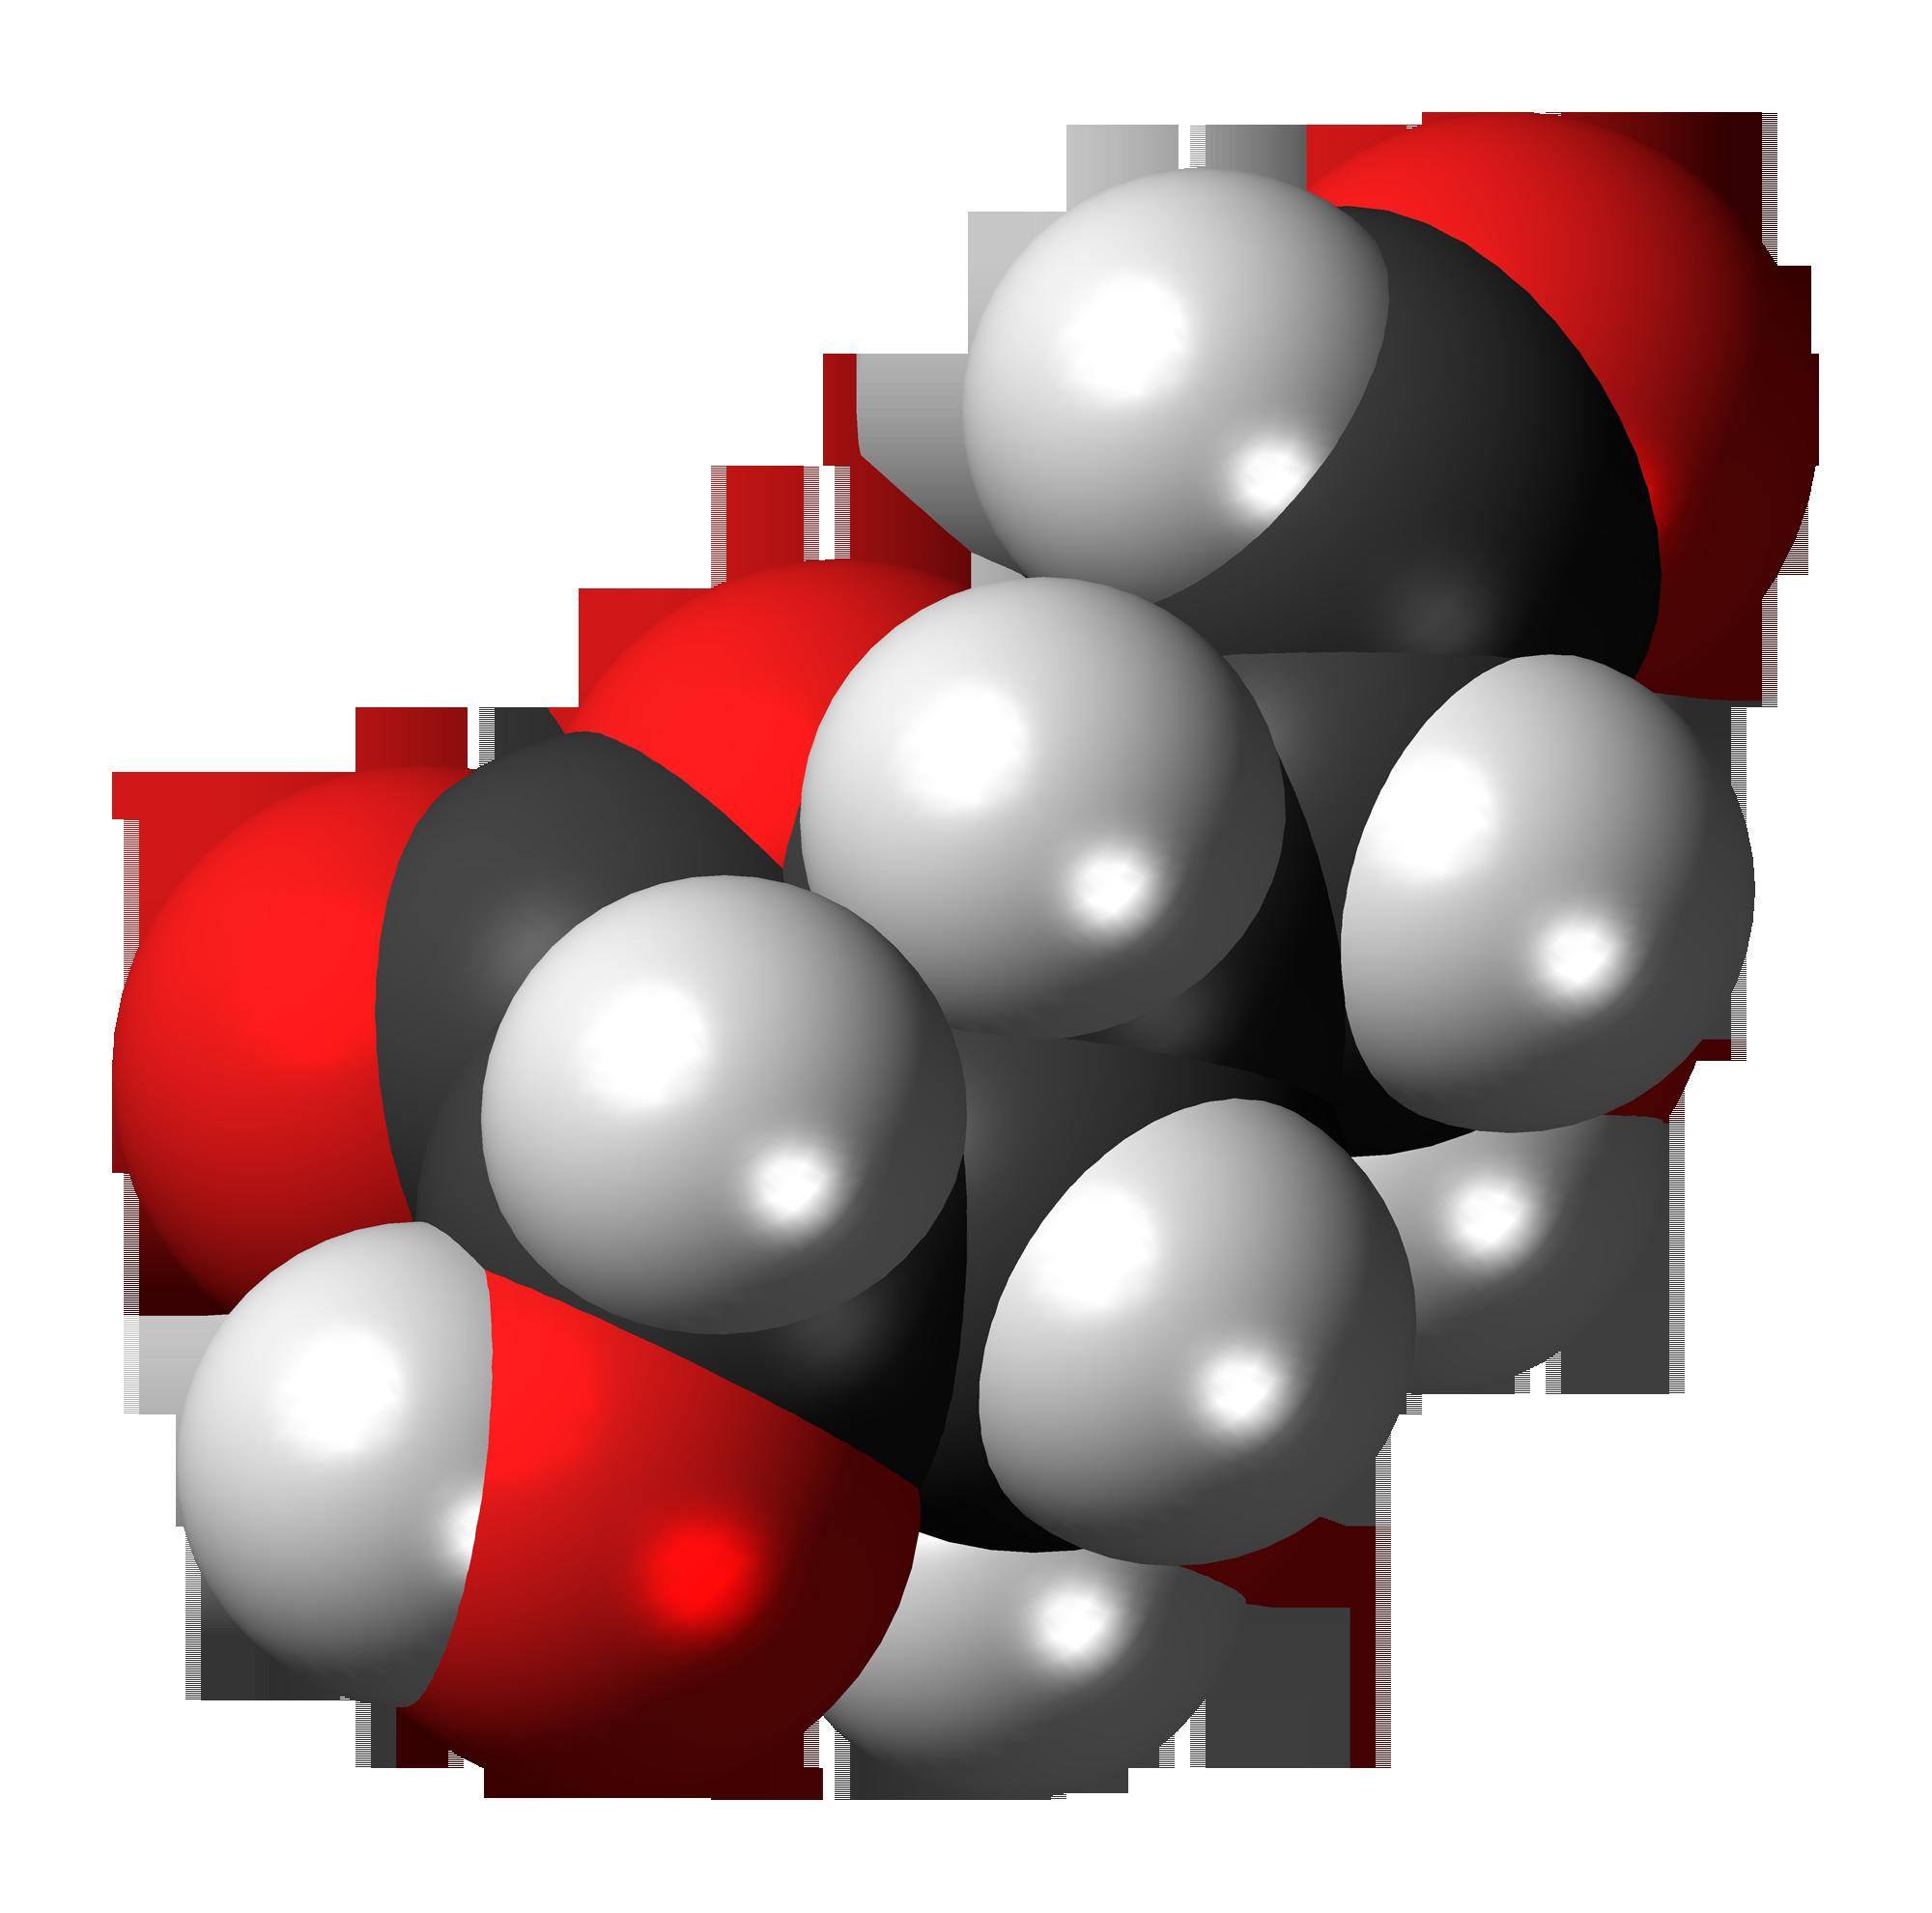 File:Glucuronolactone-(aldehyde)-3D-spacefill.png ...